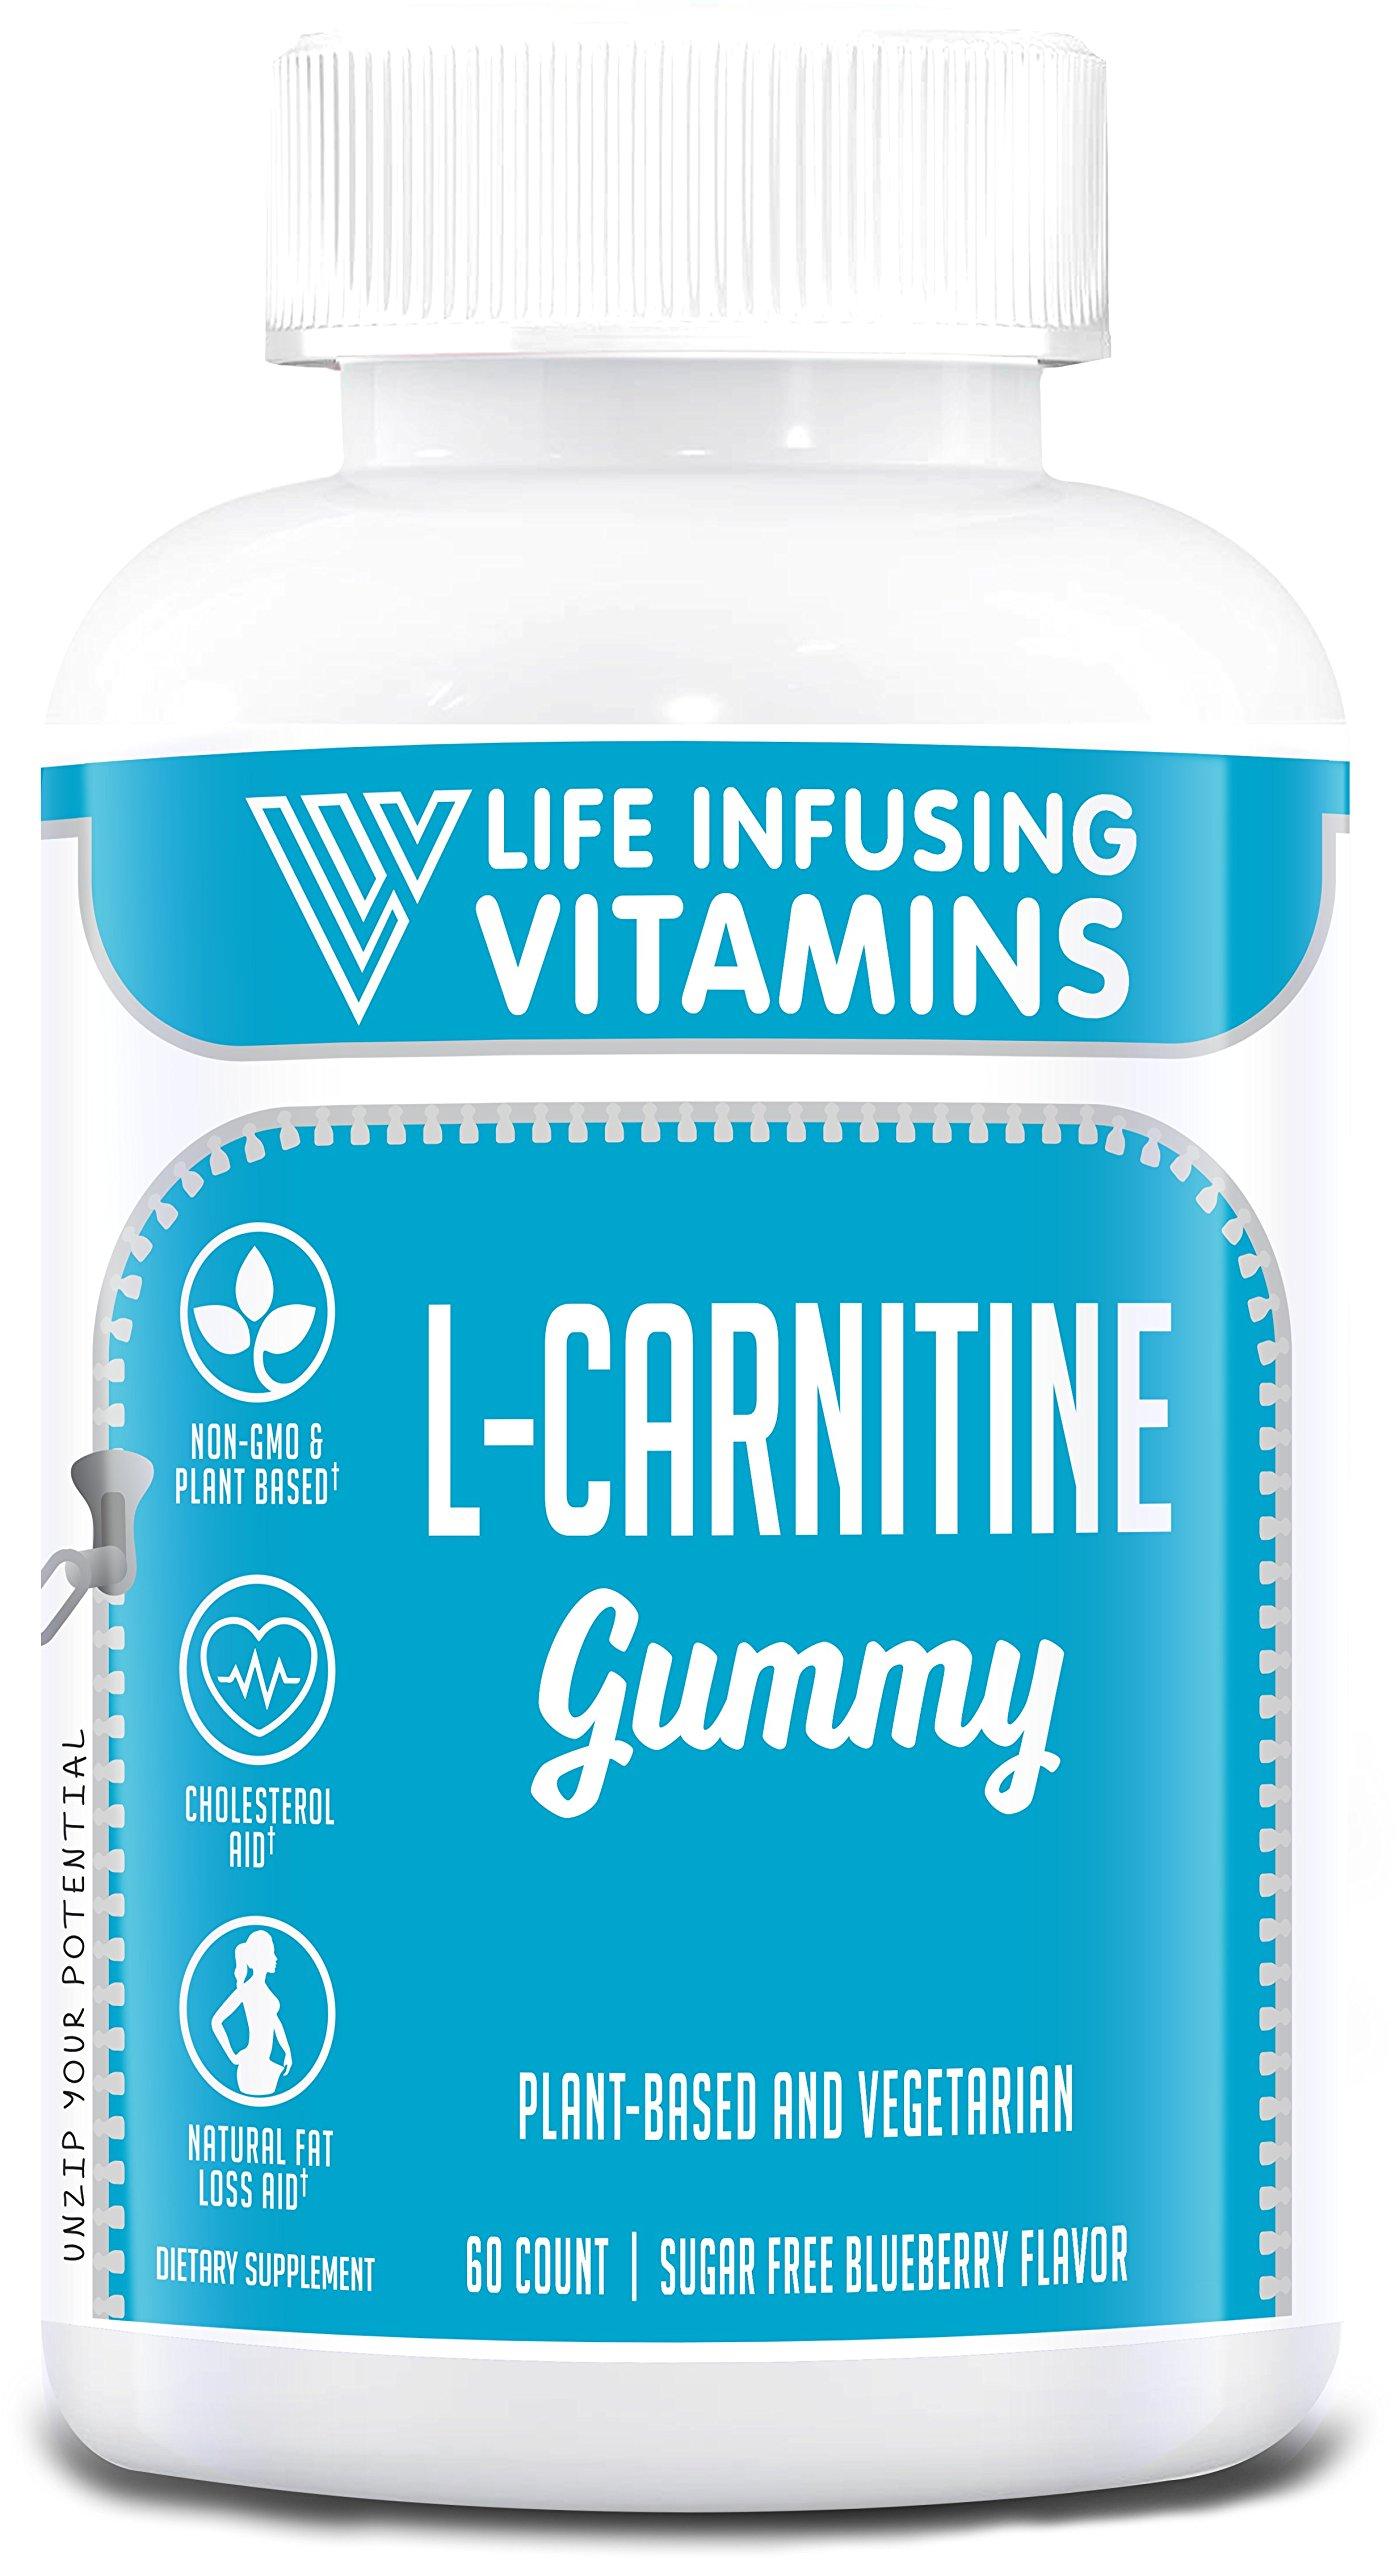 L-Carnitine Gummy, Extra Strength, 500mg, Plant Based, Vegetarian, Halal, Kosher, Sugar Free Blueberry Flavor by Life Infusing Vitamins (LIV)